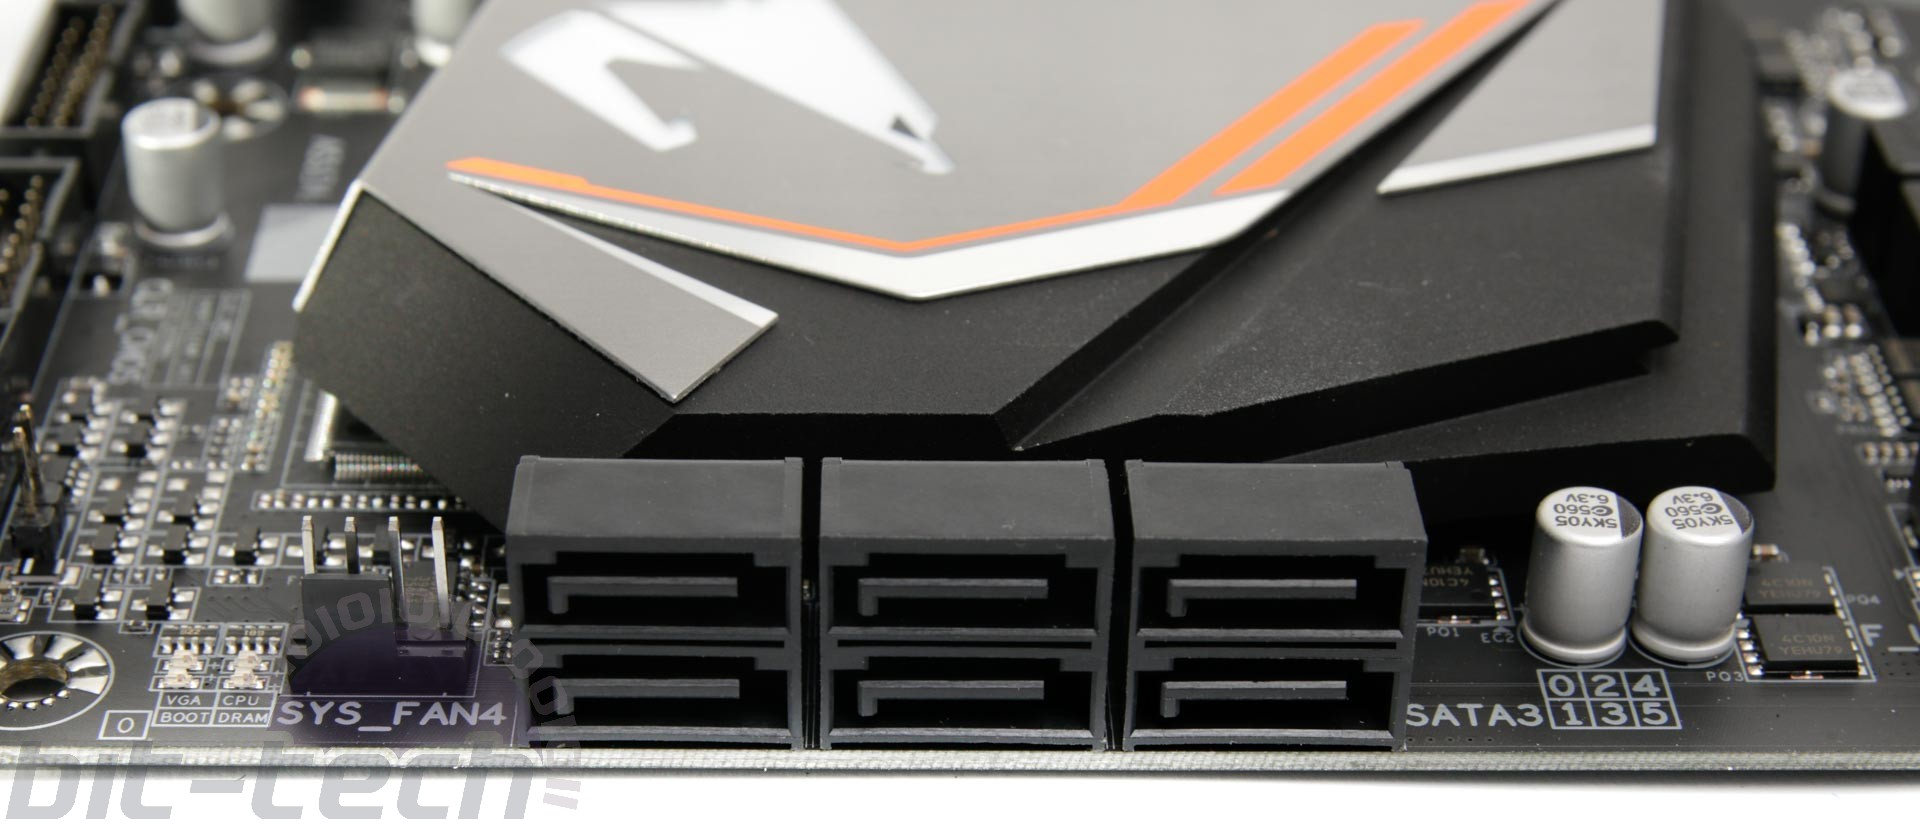 Gigabyte X470 Aorus Ultra Gaming Review | bit-tech net